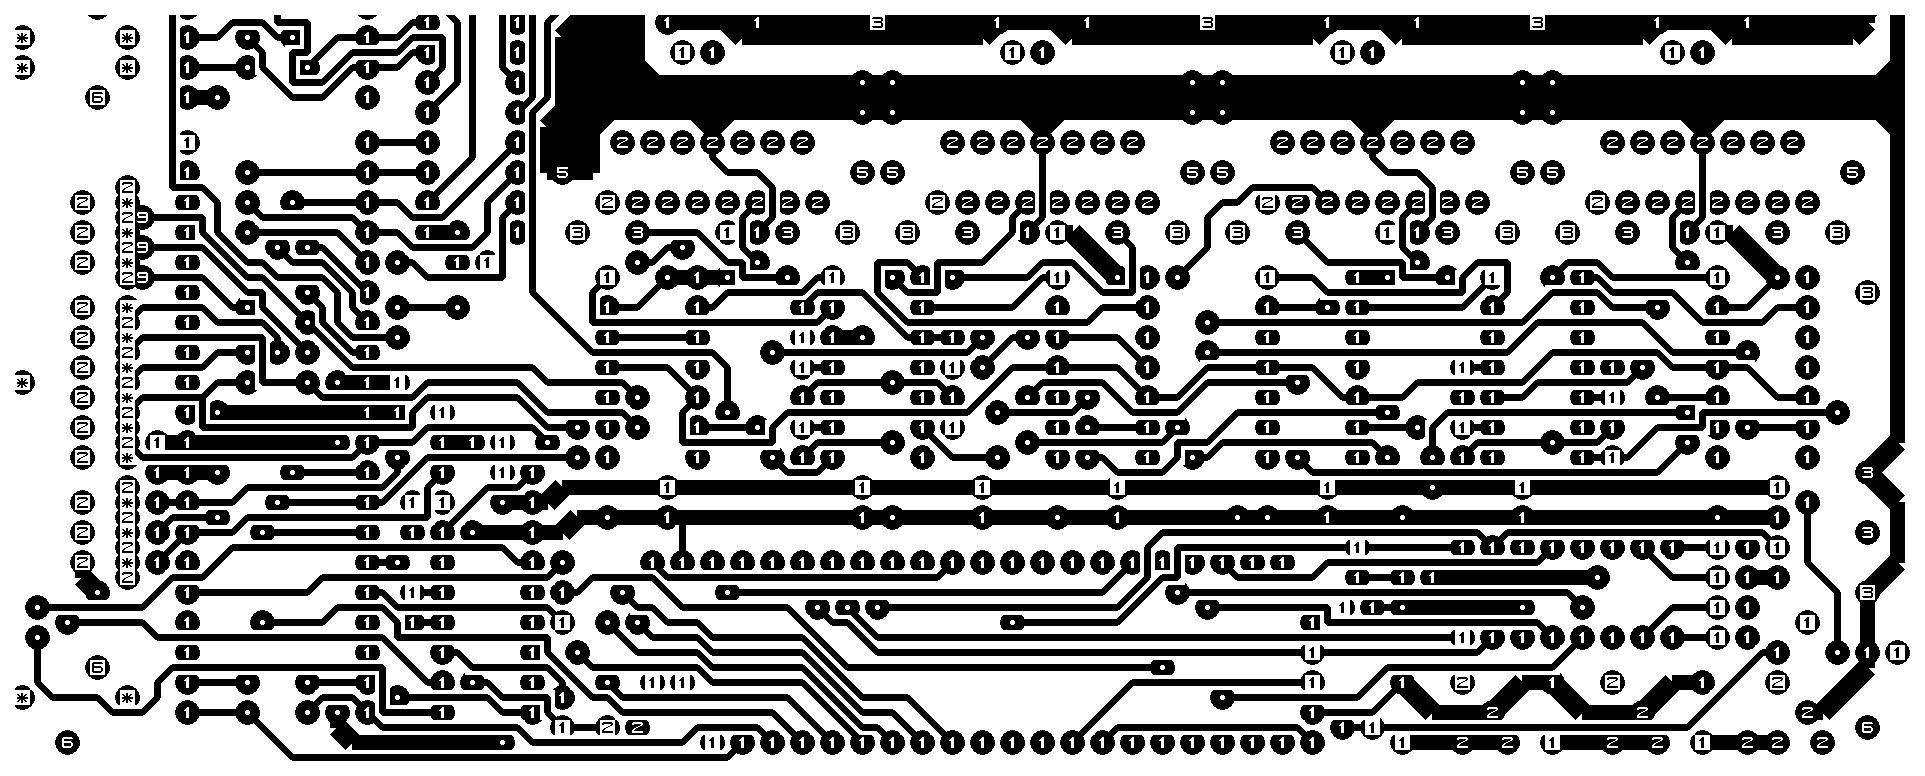 CNC Axis4 Board Schematics (Rev. A)